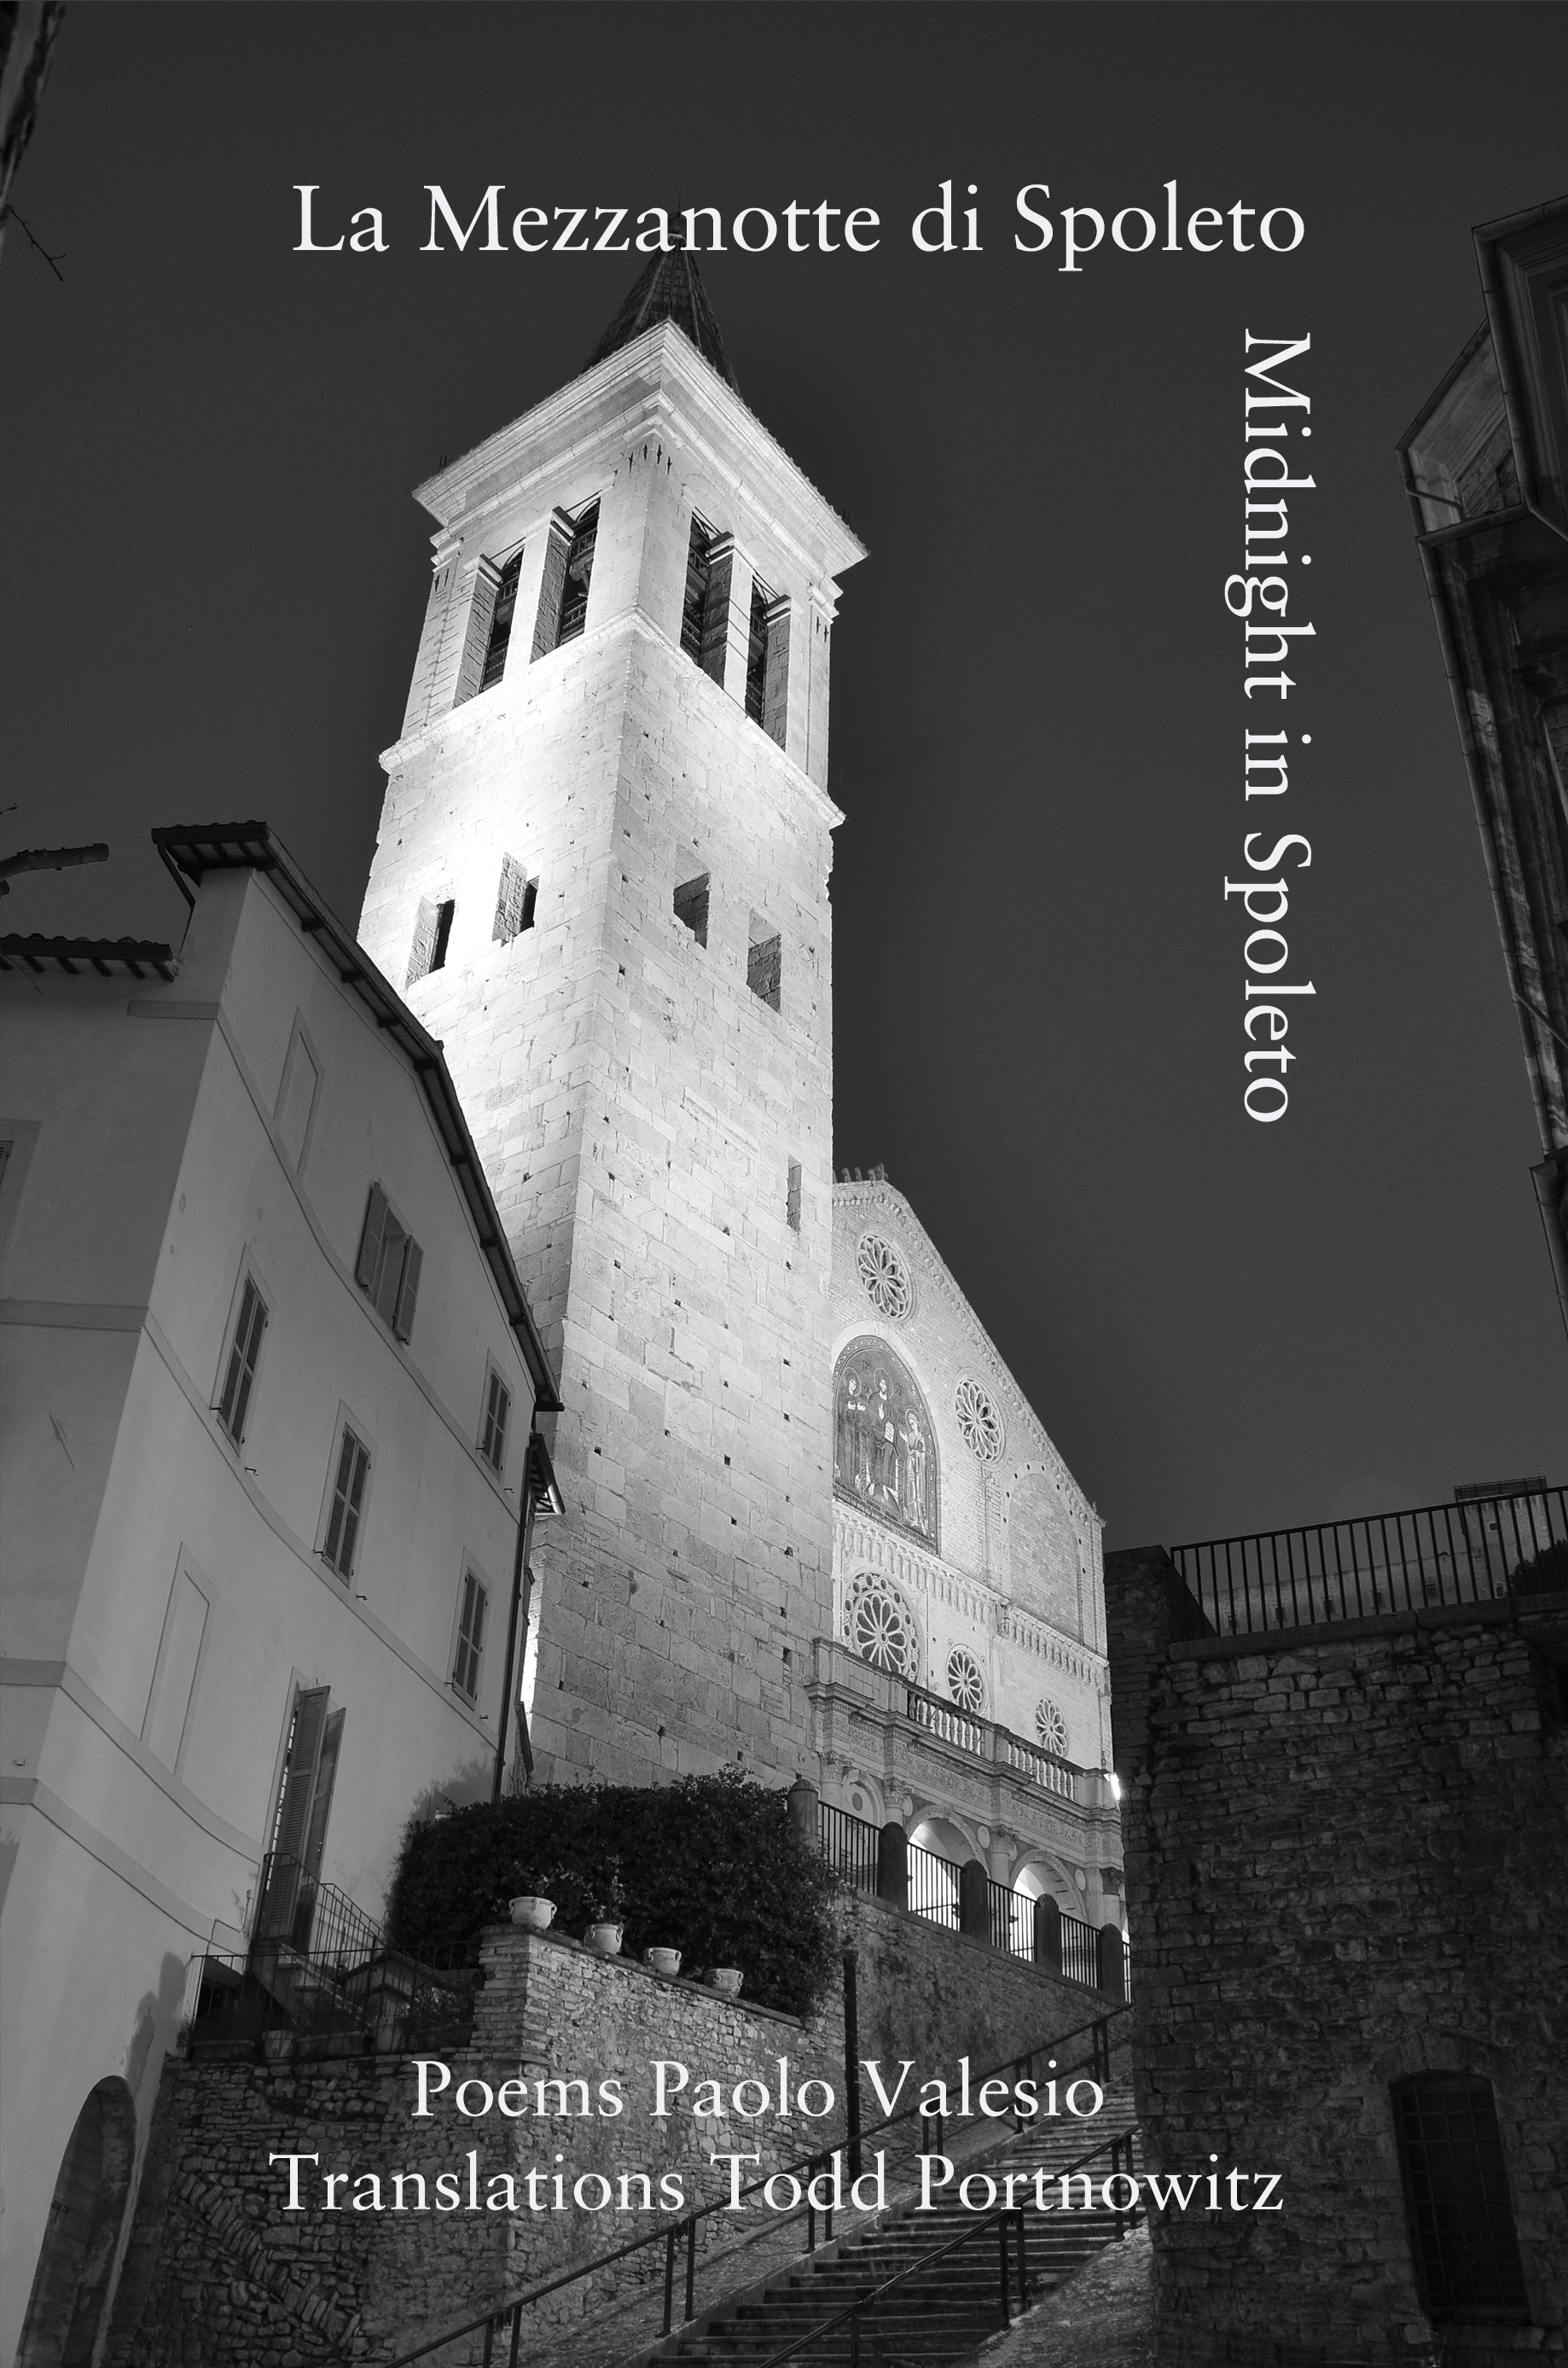 [Poet & Translator:A Bilingual Reading from Midnight in Spoleto]